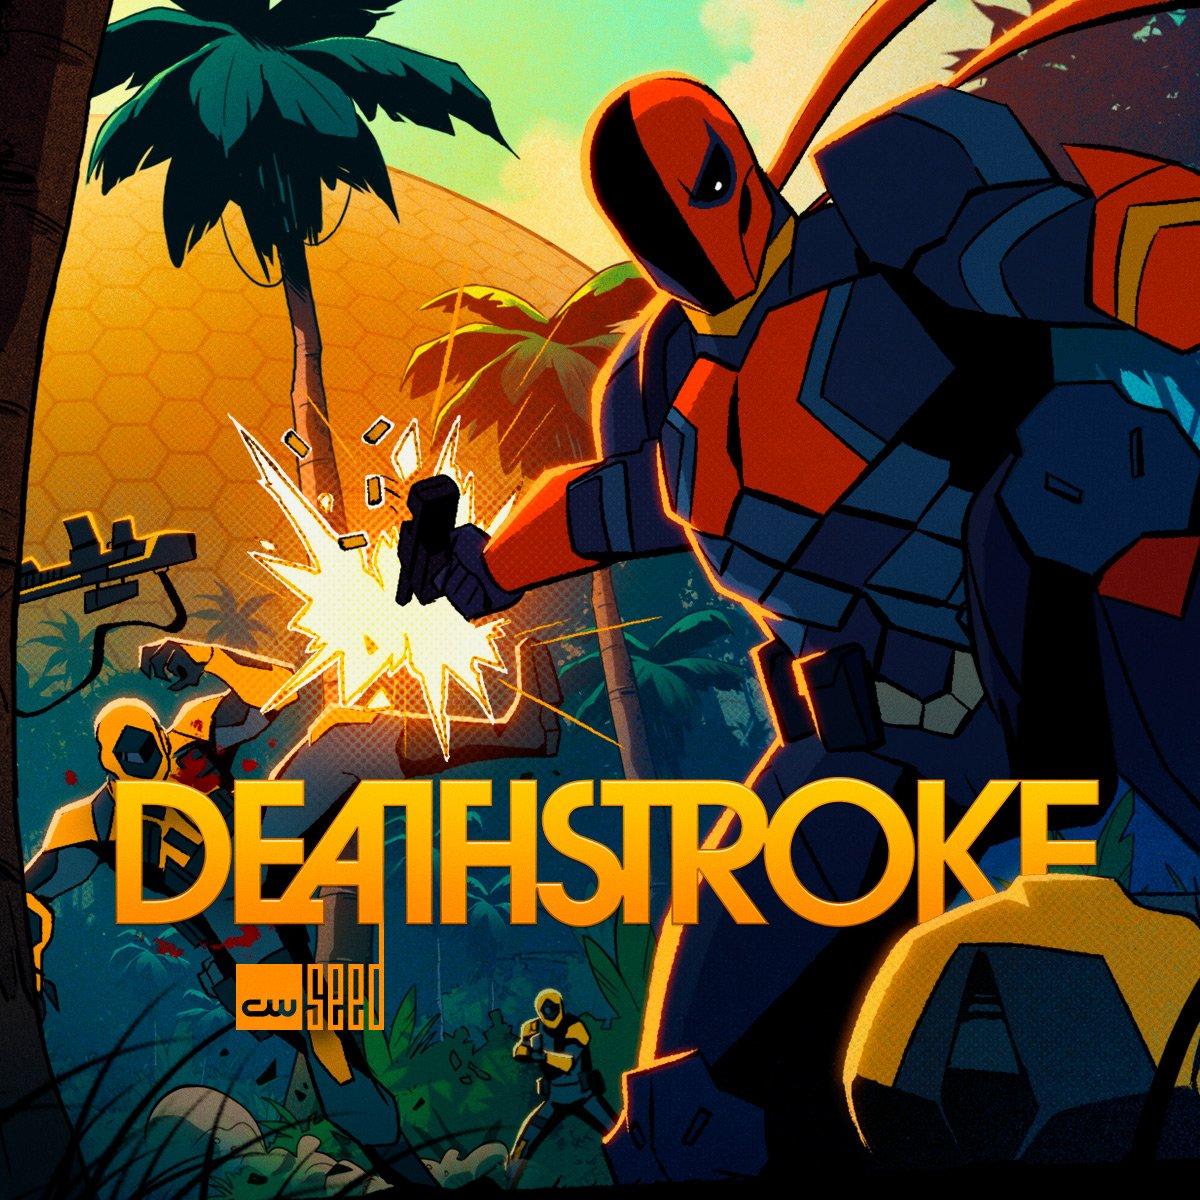 Deathstroke - CW Seed